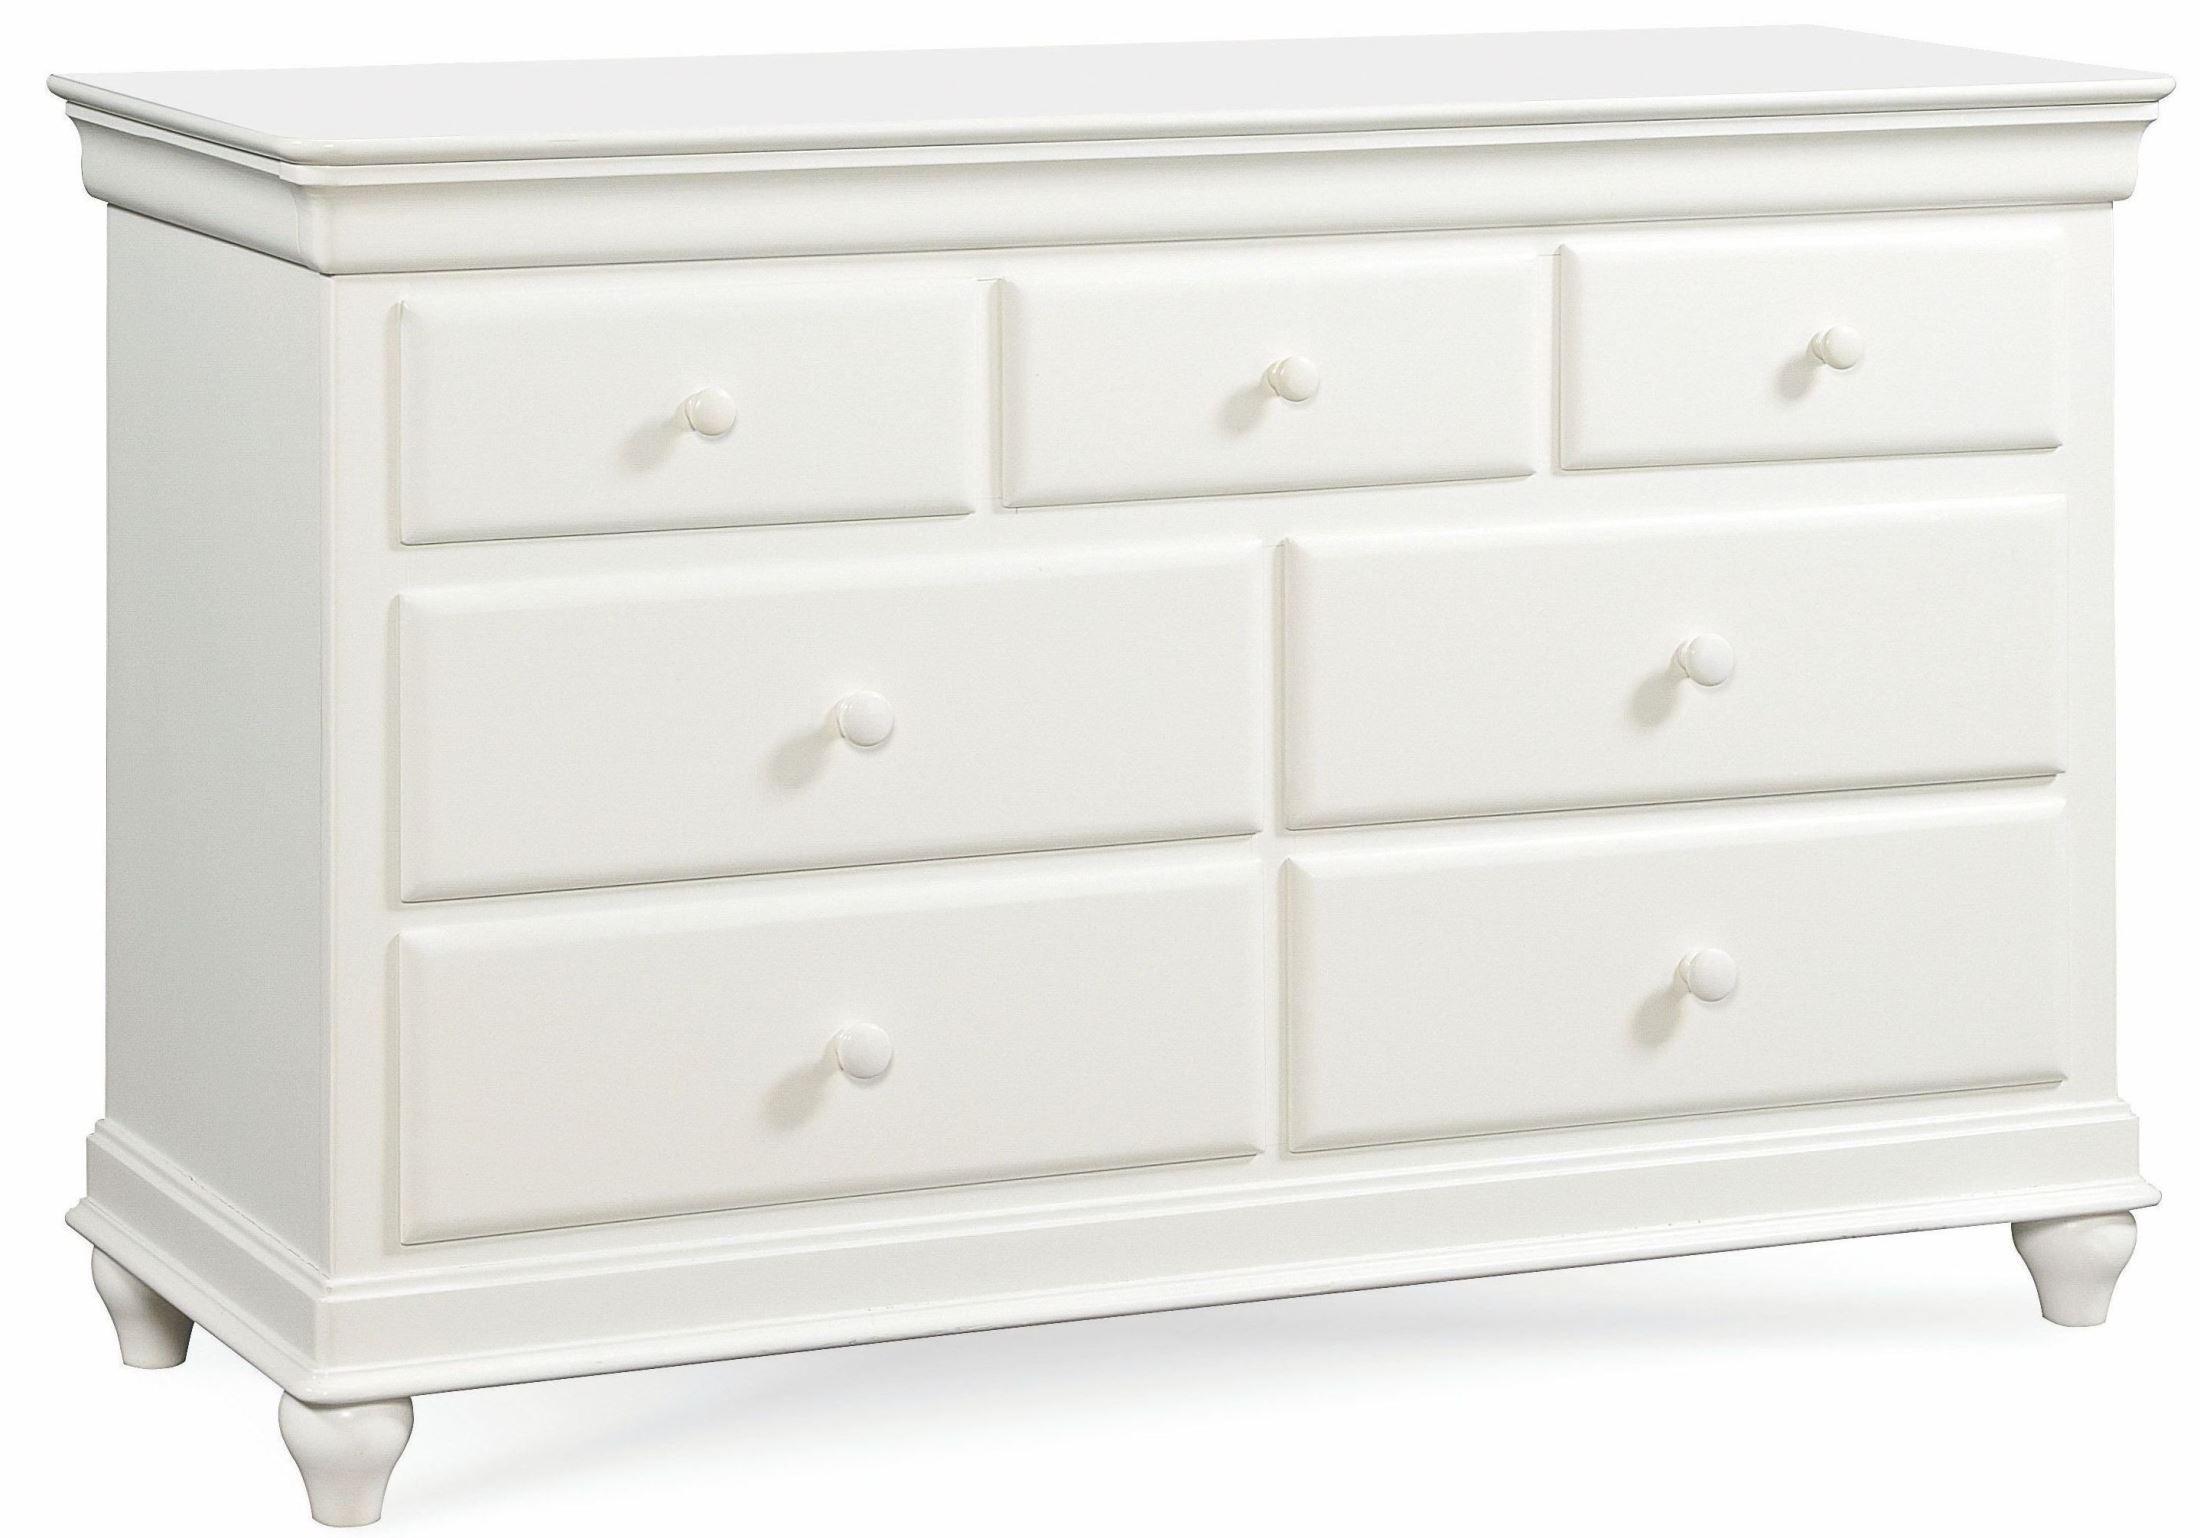 Classics smartstuff saddle summer white dresser from